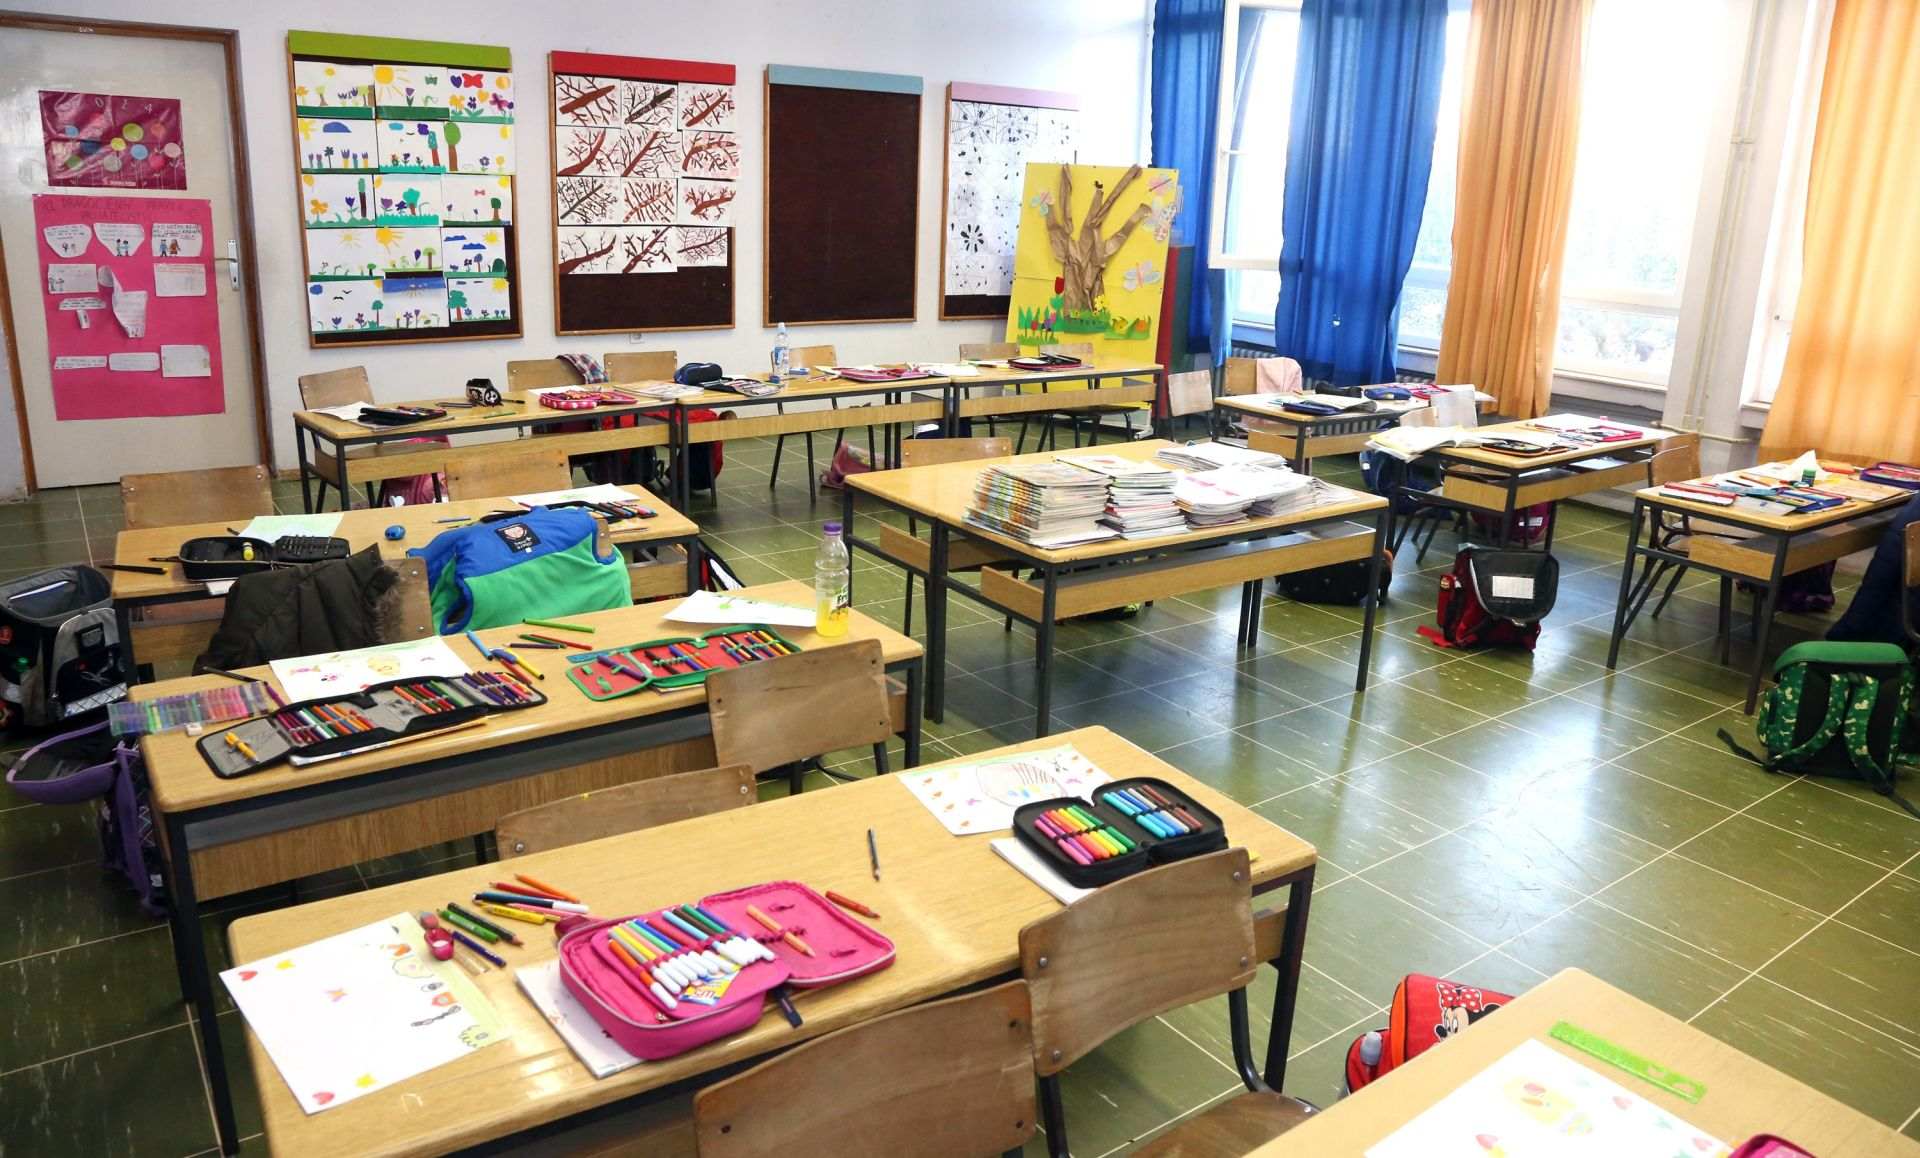 VOZAČI OPREZ: Počela nova školska godina